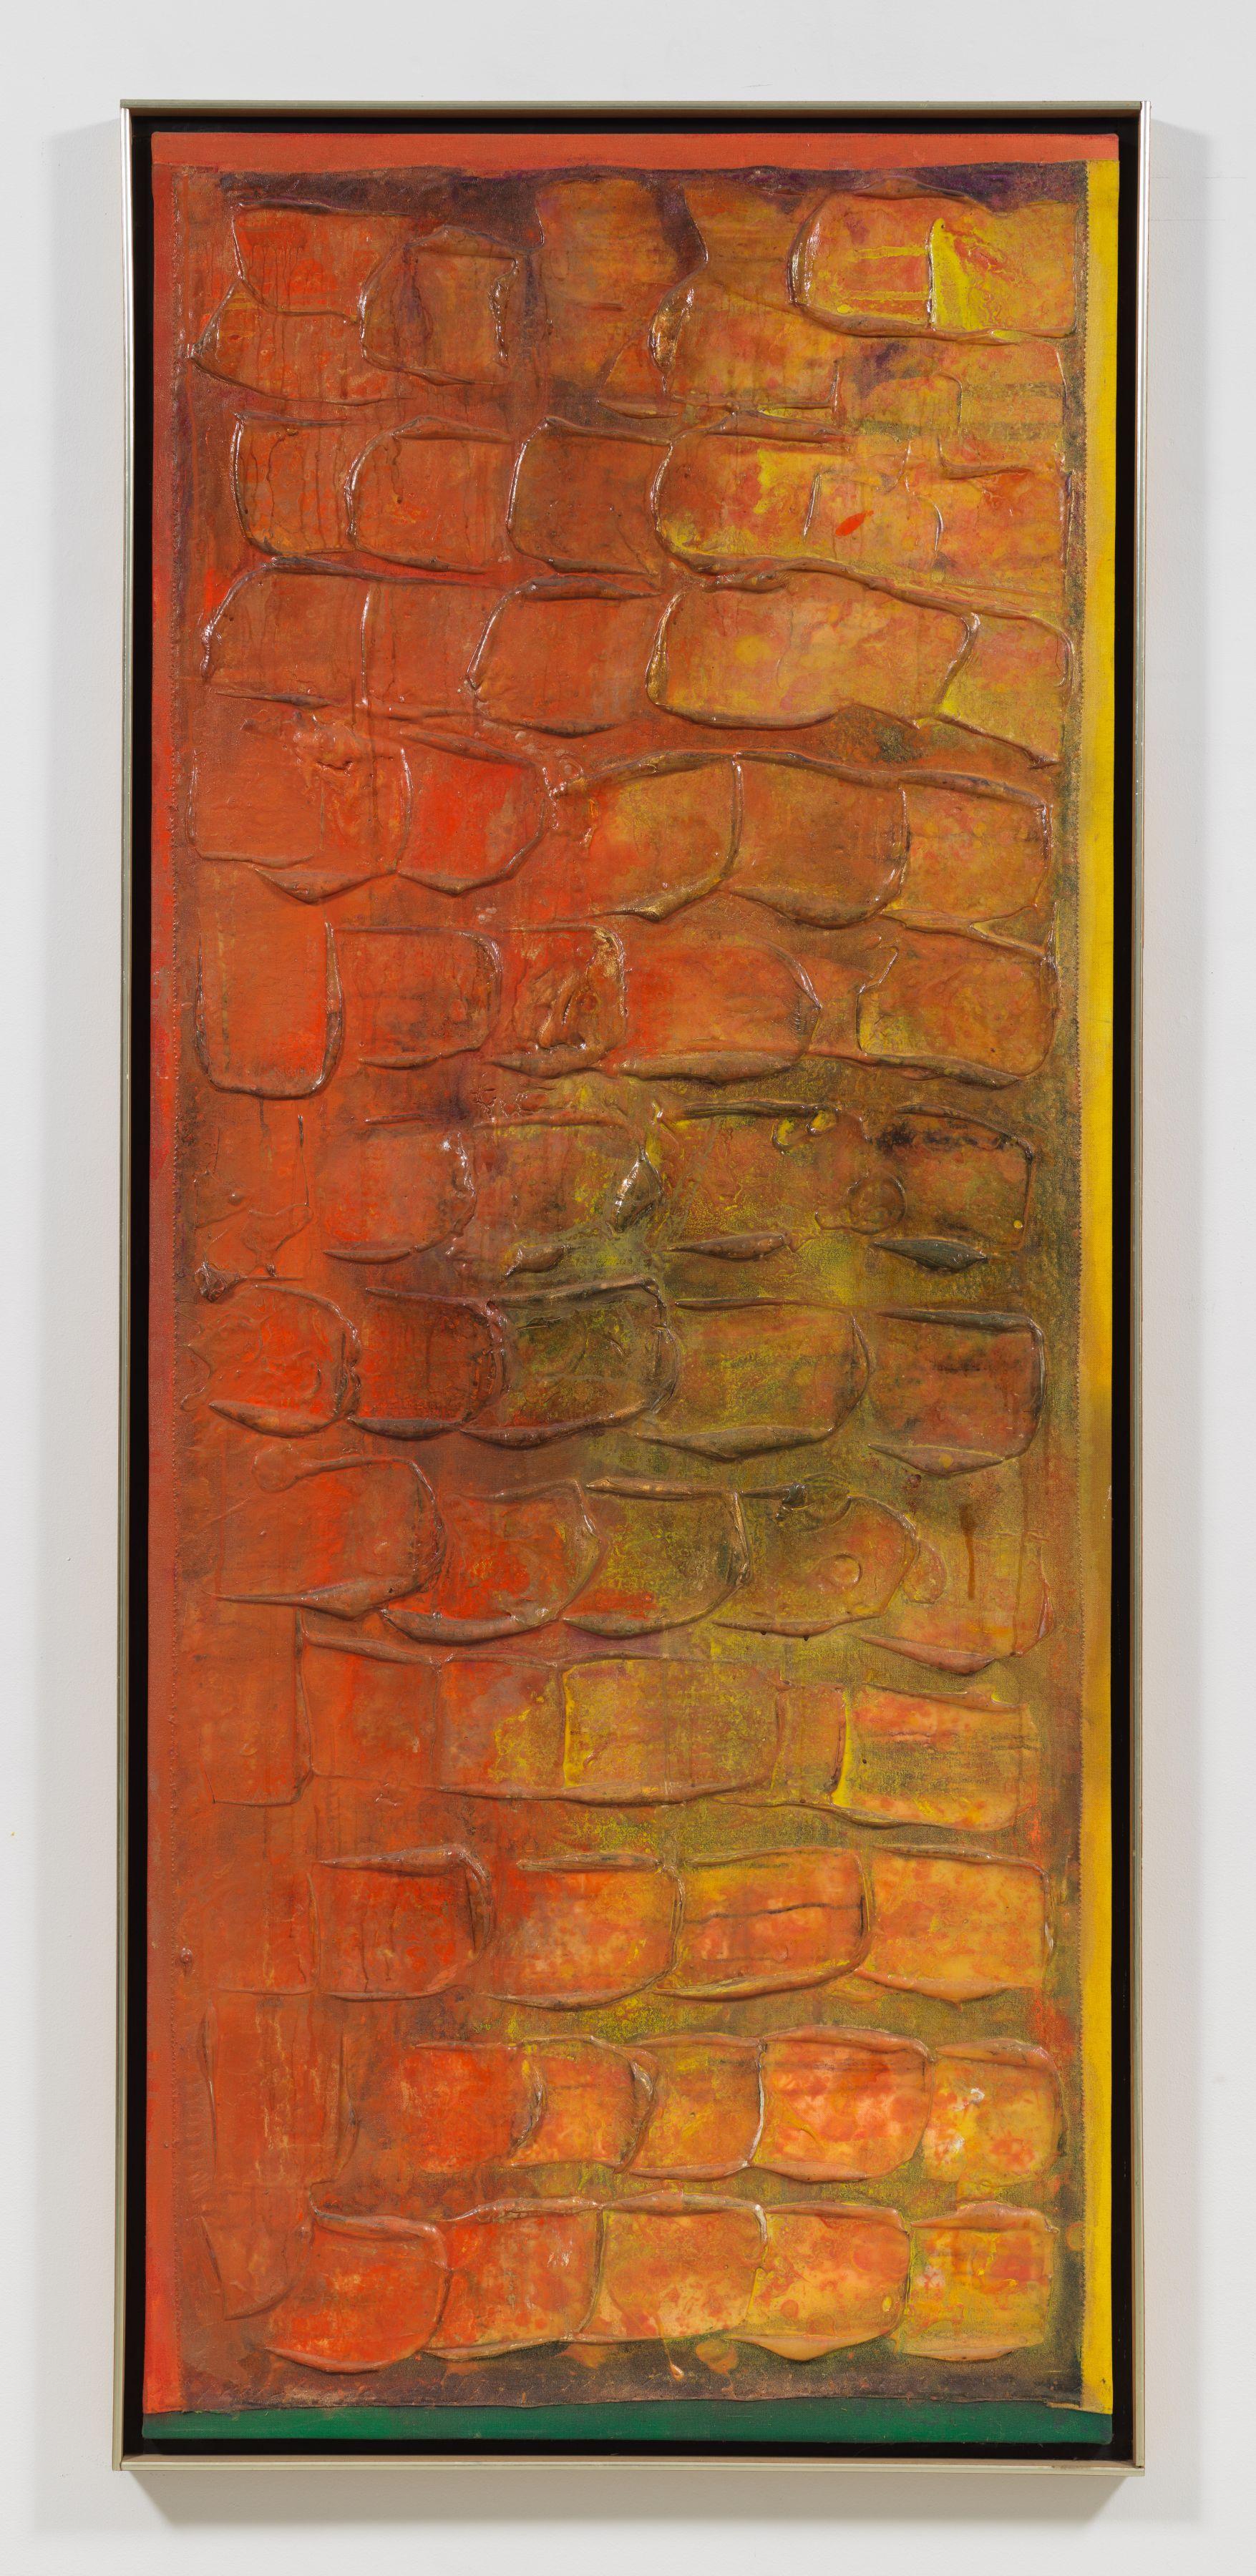 Dawnshoot, 1991 Acrylic on collaged canvas